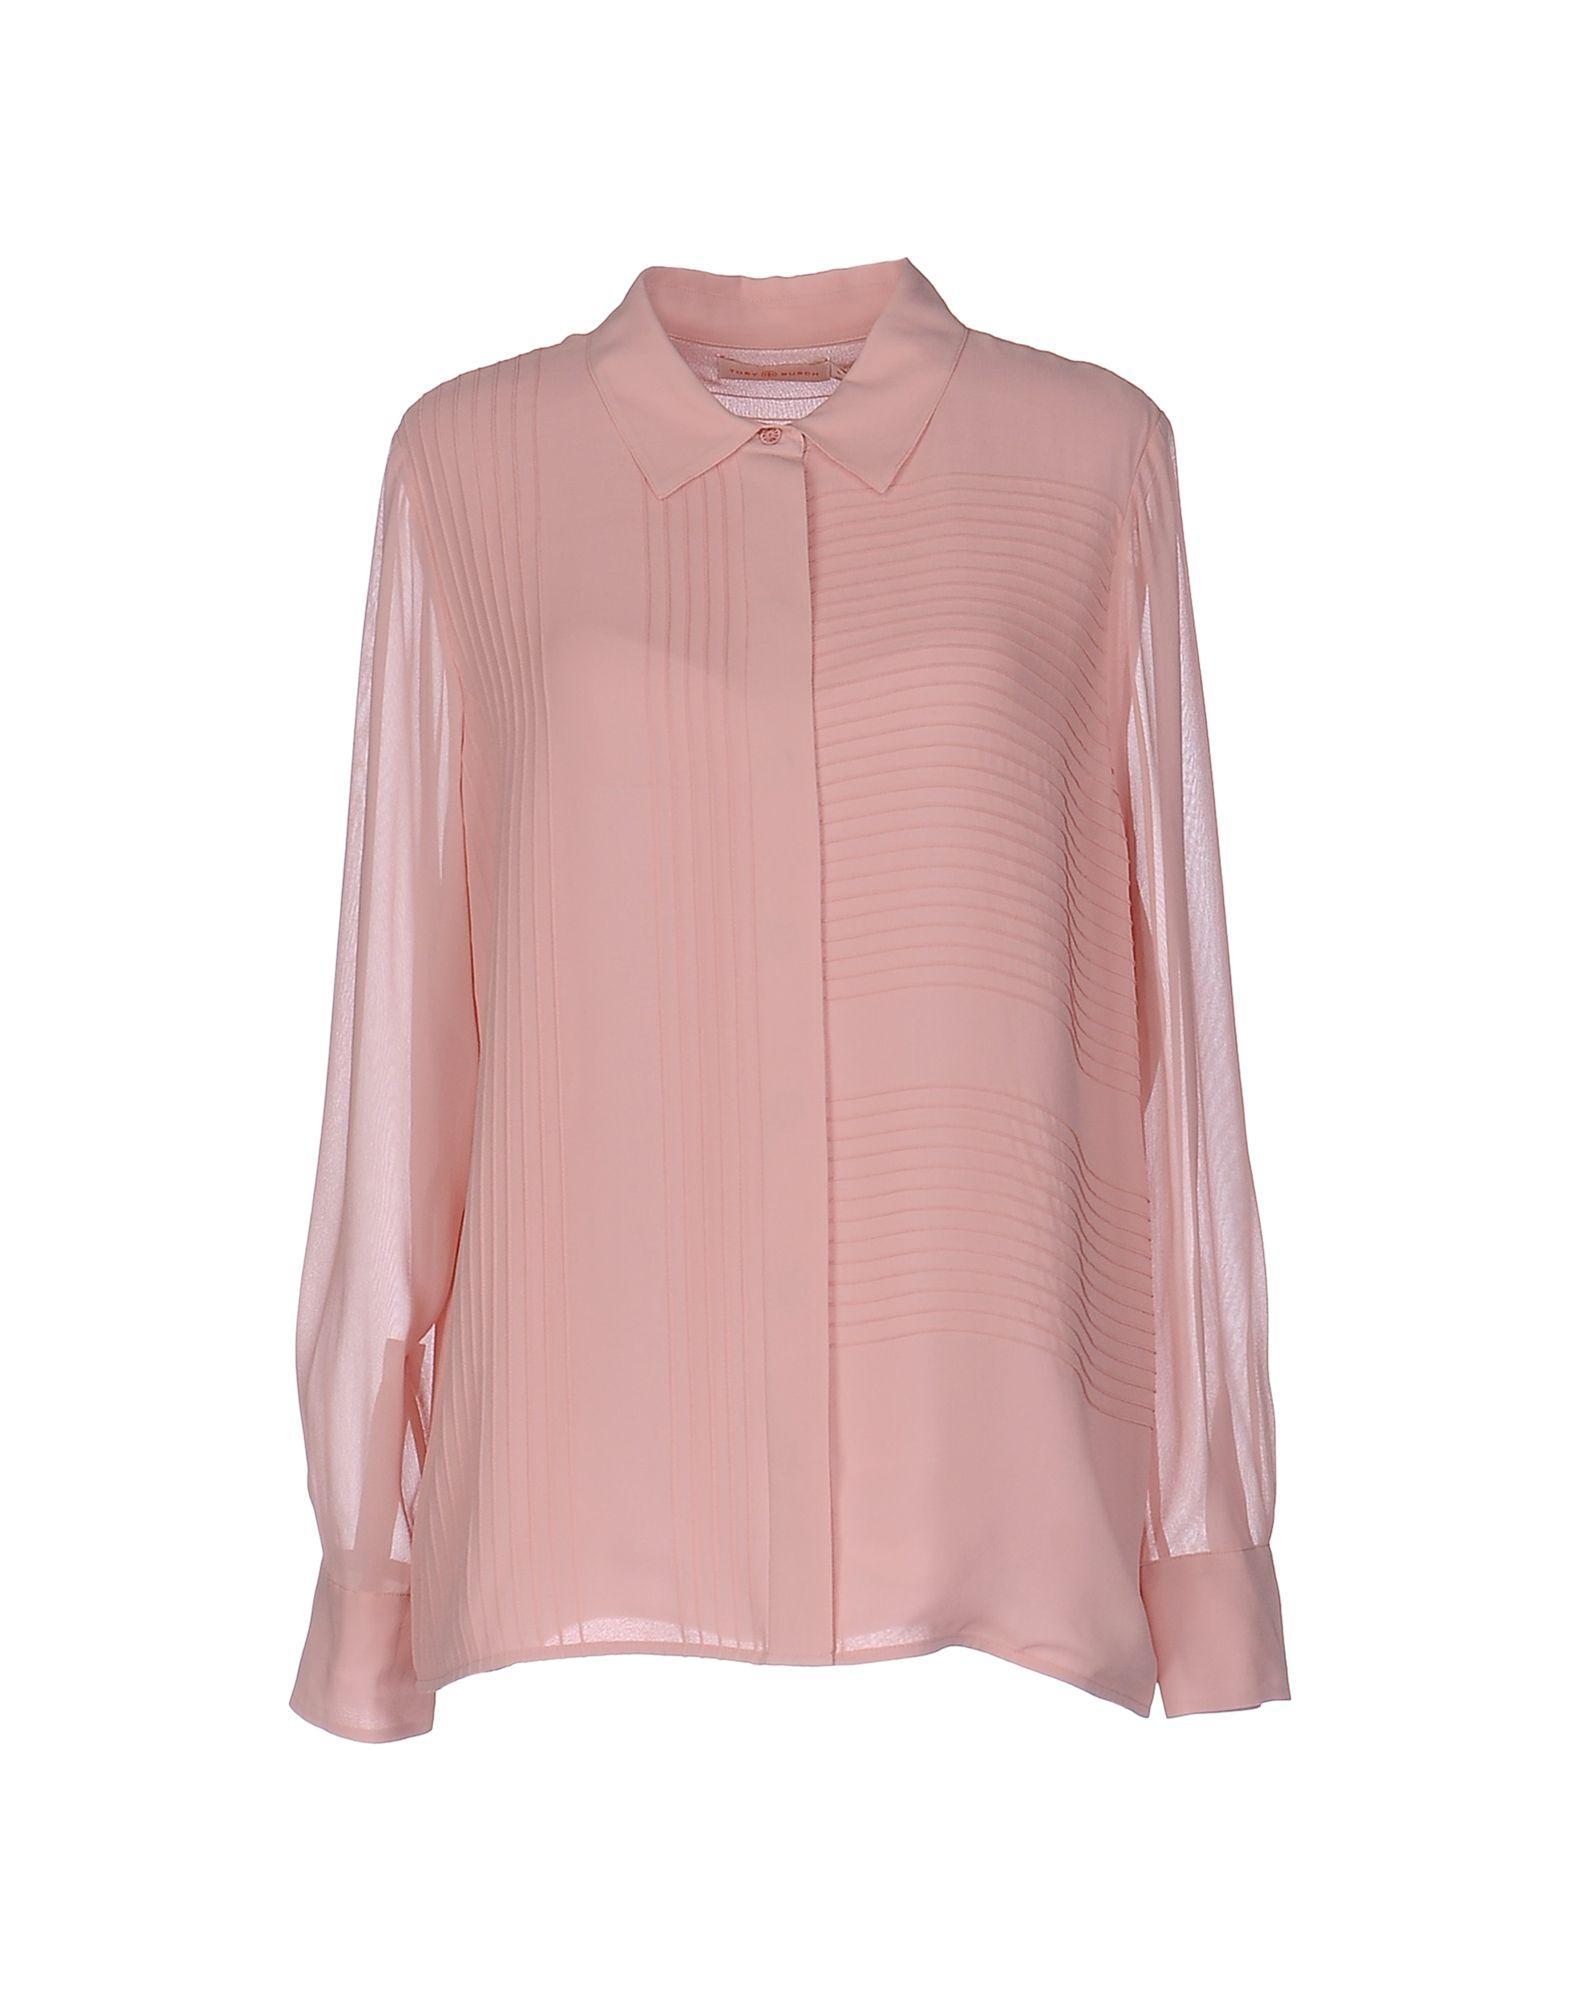 Tory Burch Shirt In Pink Lyst